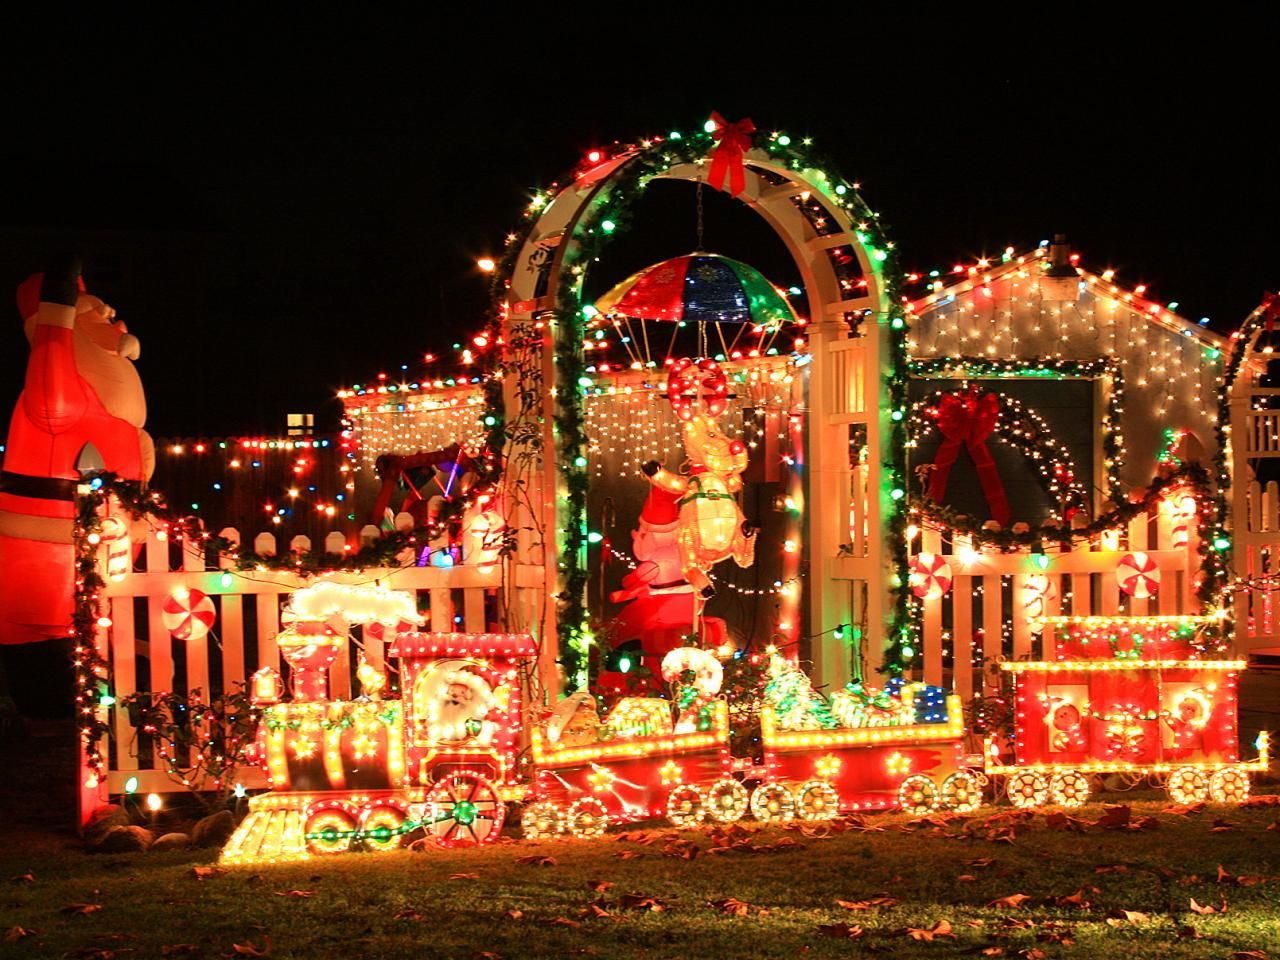 iStock-11470900_colorful-christmas-lights-exterior-front-yard-walkway_s4x3.jpg.rend.hgtvcom.1280.960.jpeg  (JPEG-afbeelding, 1280  960 pixels) - Ge